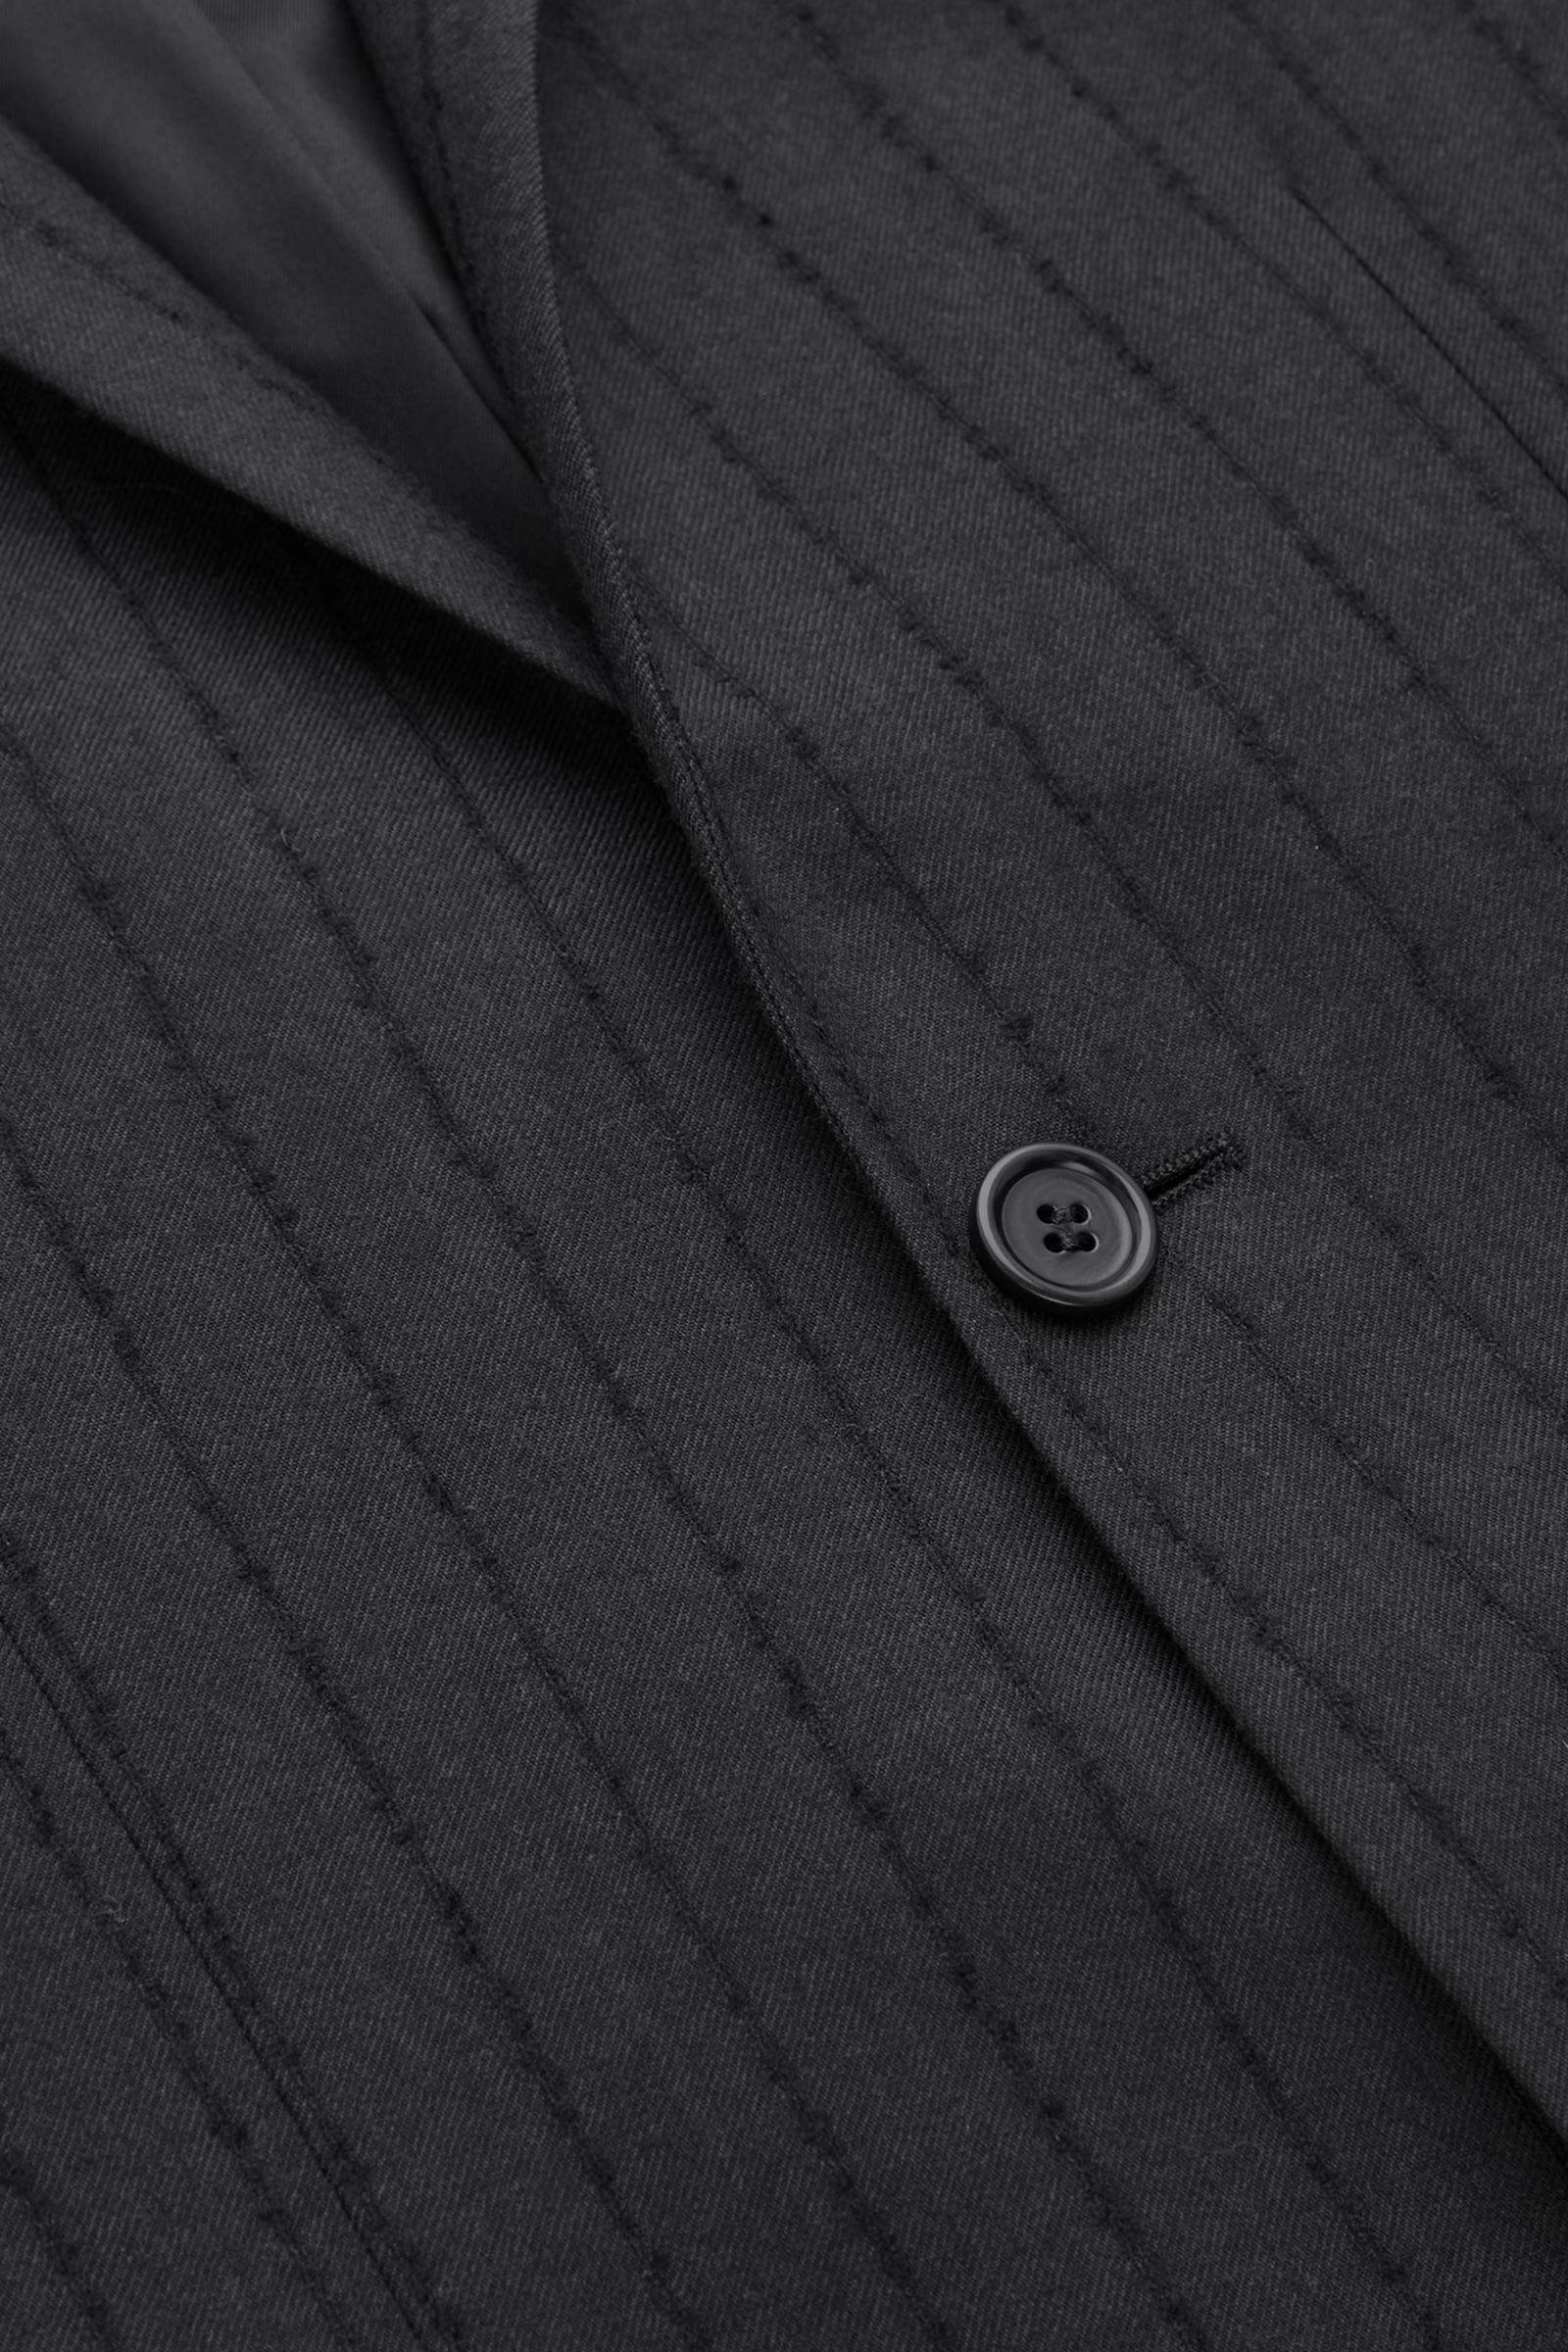 COS 슬림 핏 울 핀스트라이프 블레이저의 블랙컬러 Detail입니다.